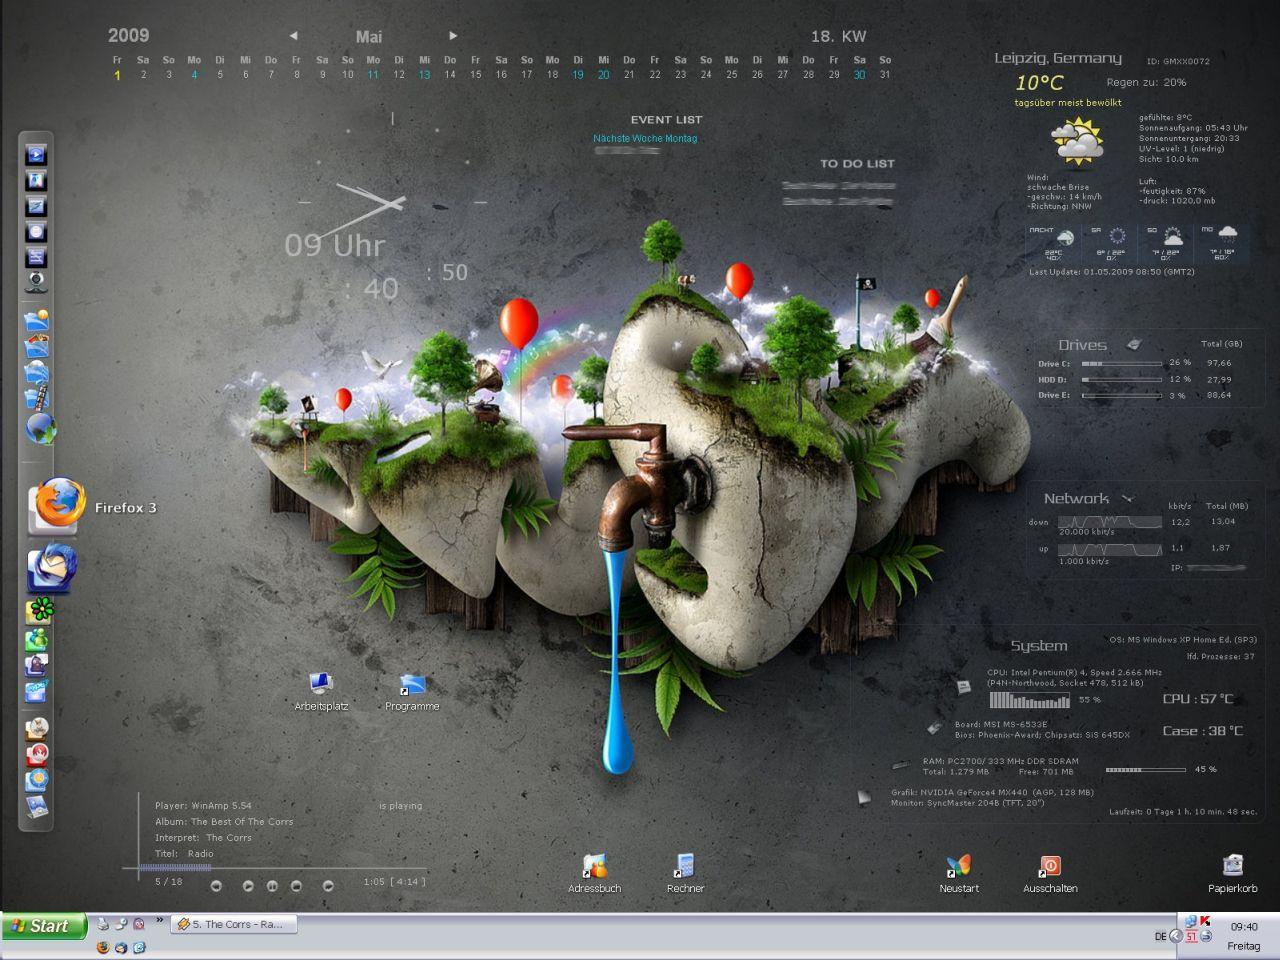 desktop_518jbt.jpg